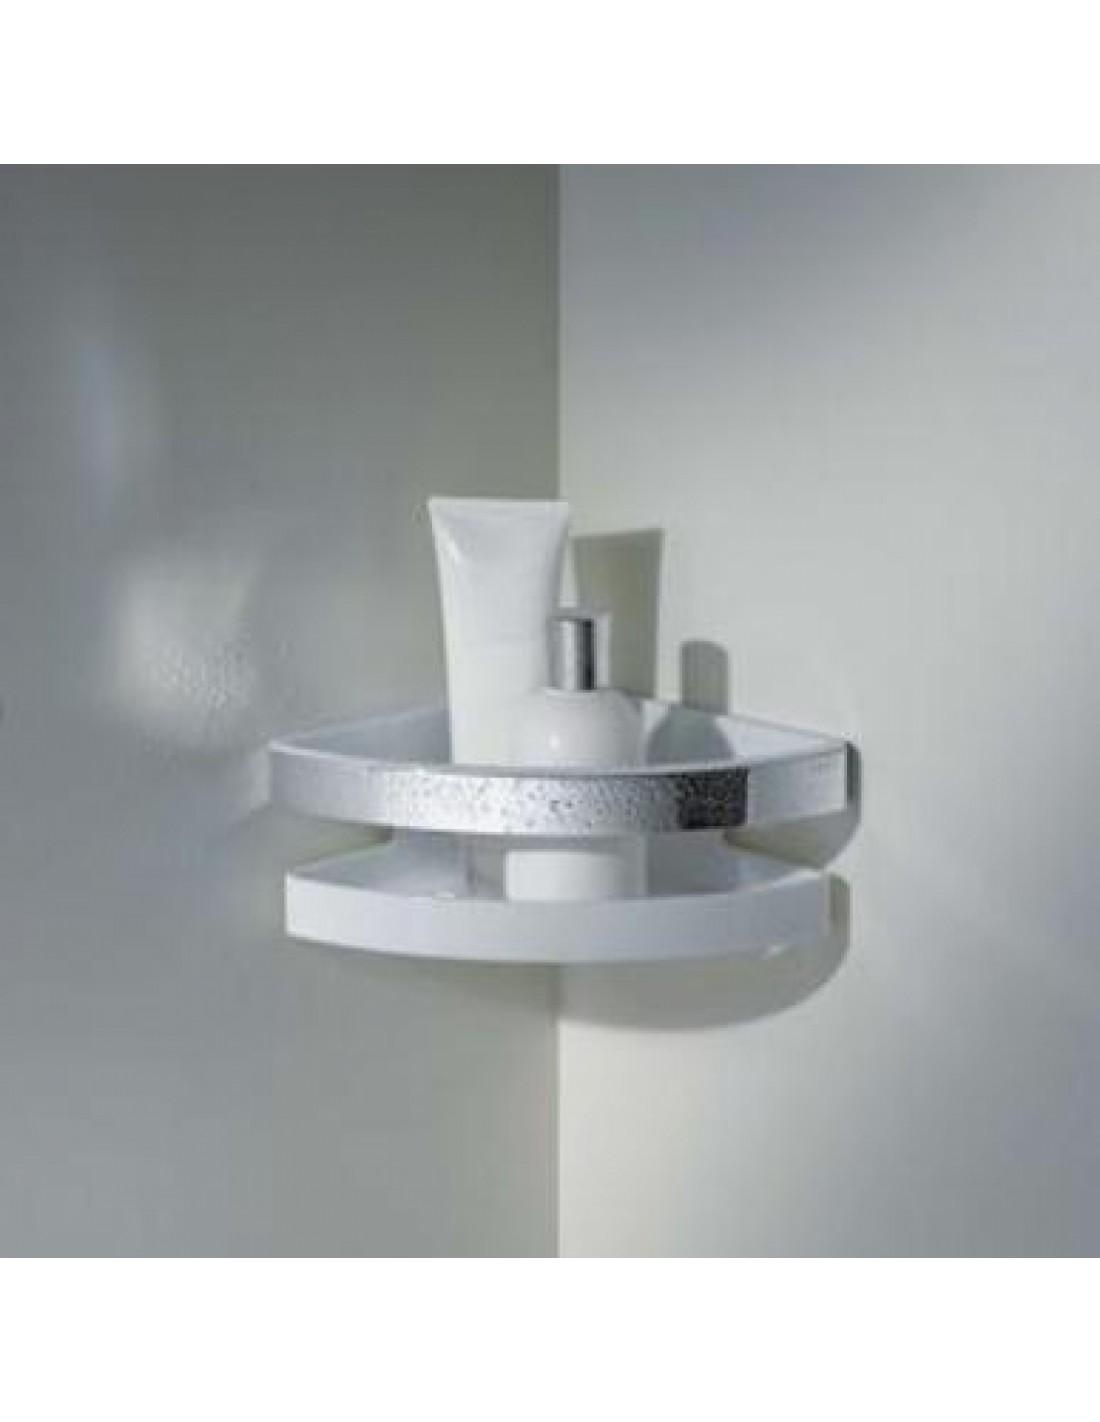 Porte savon d 39 angle de douche moll - Porte de douche d angle ...